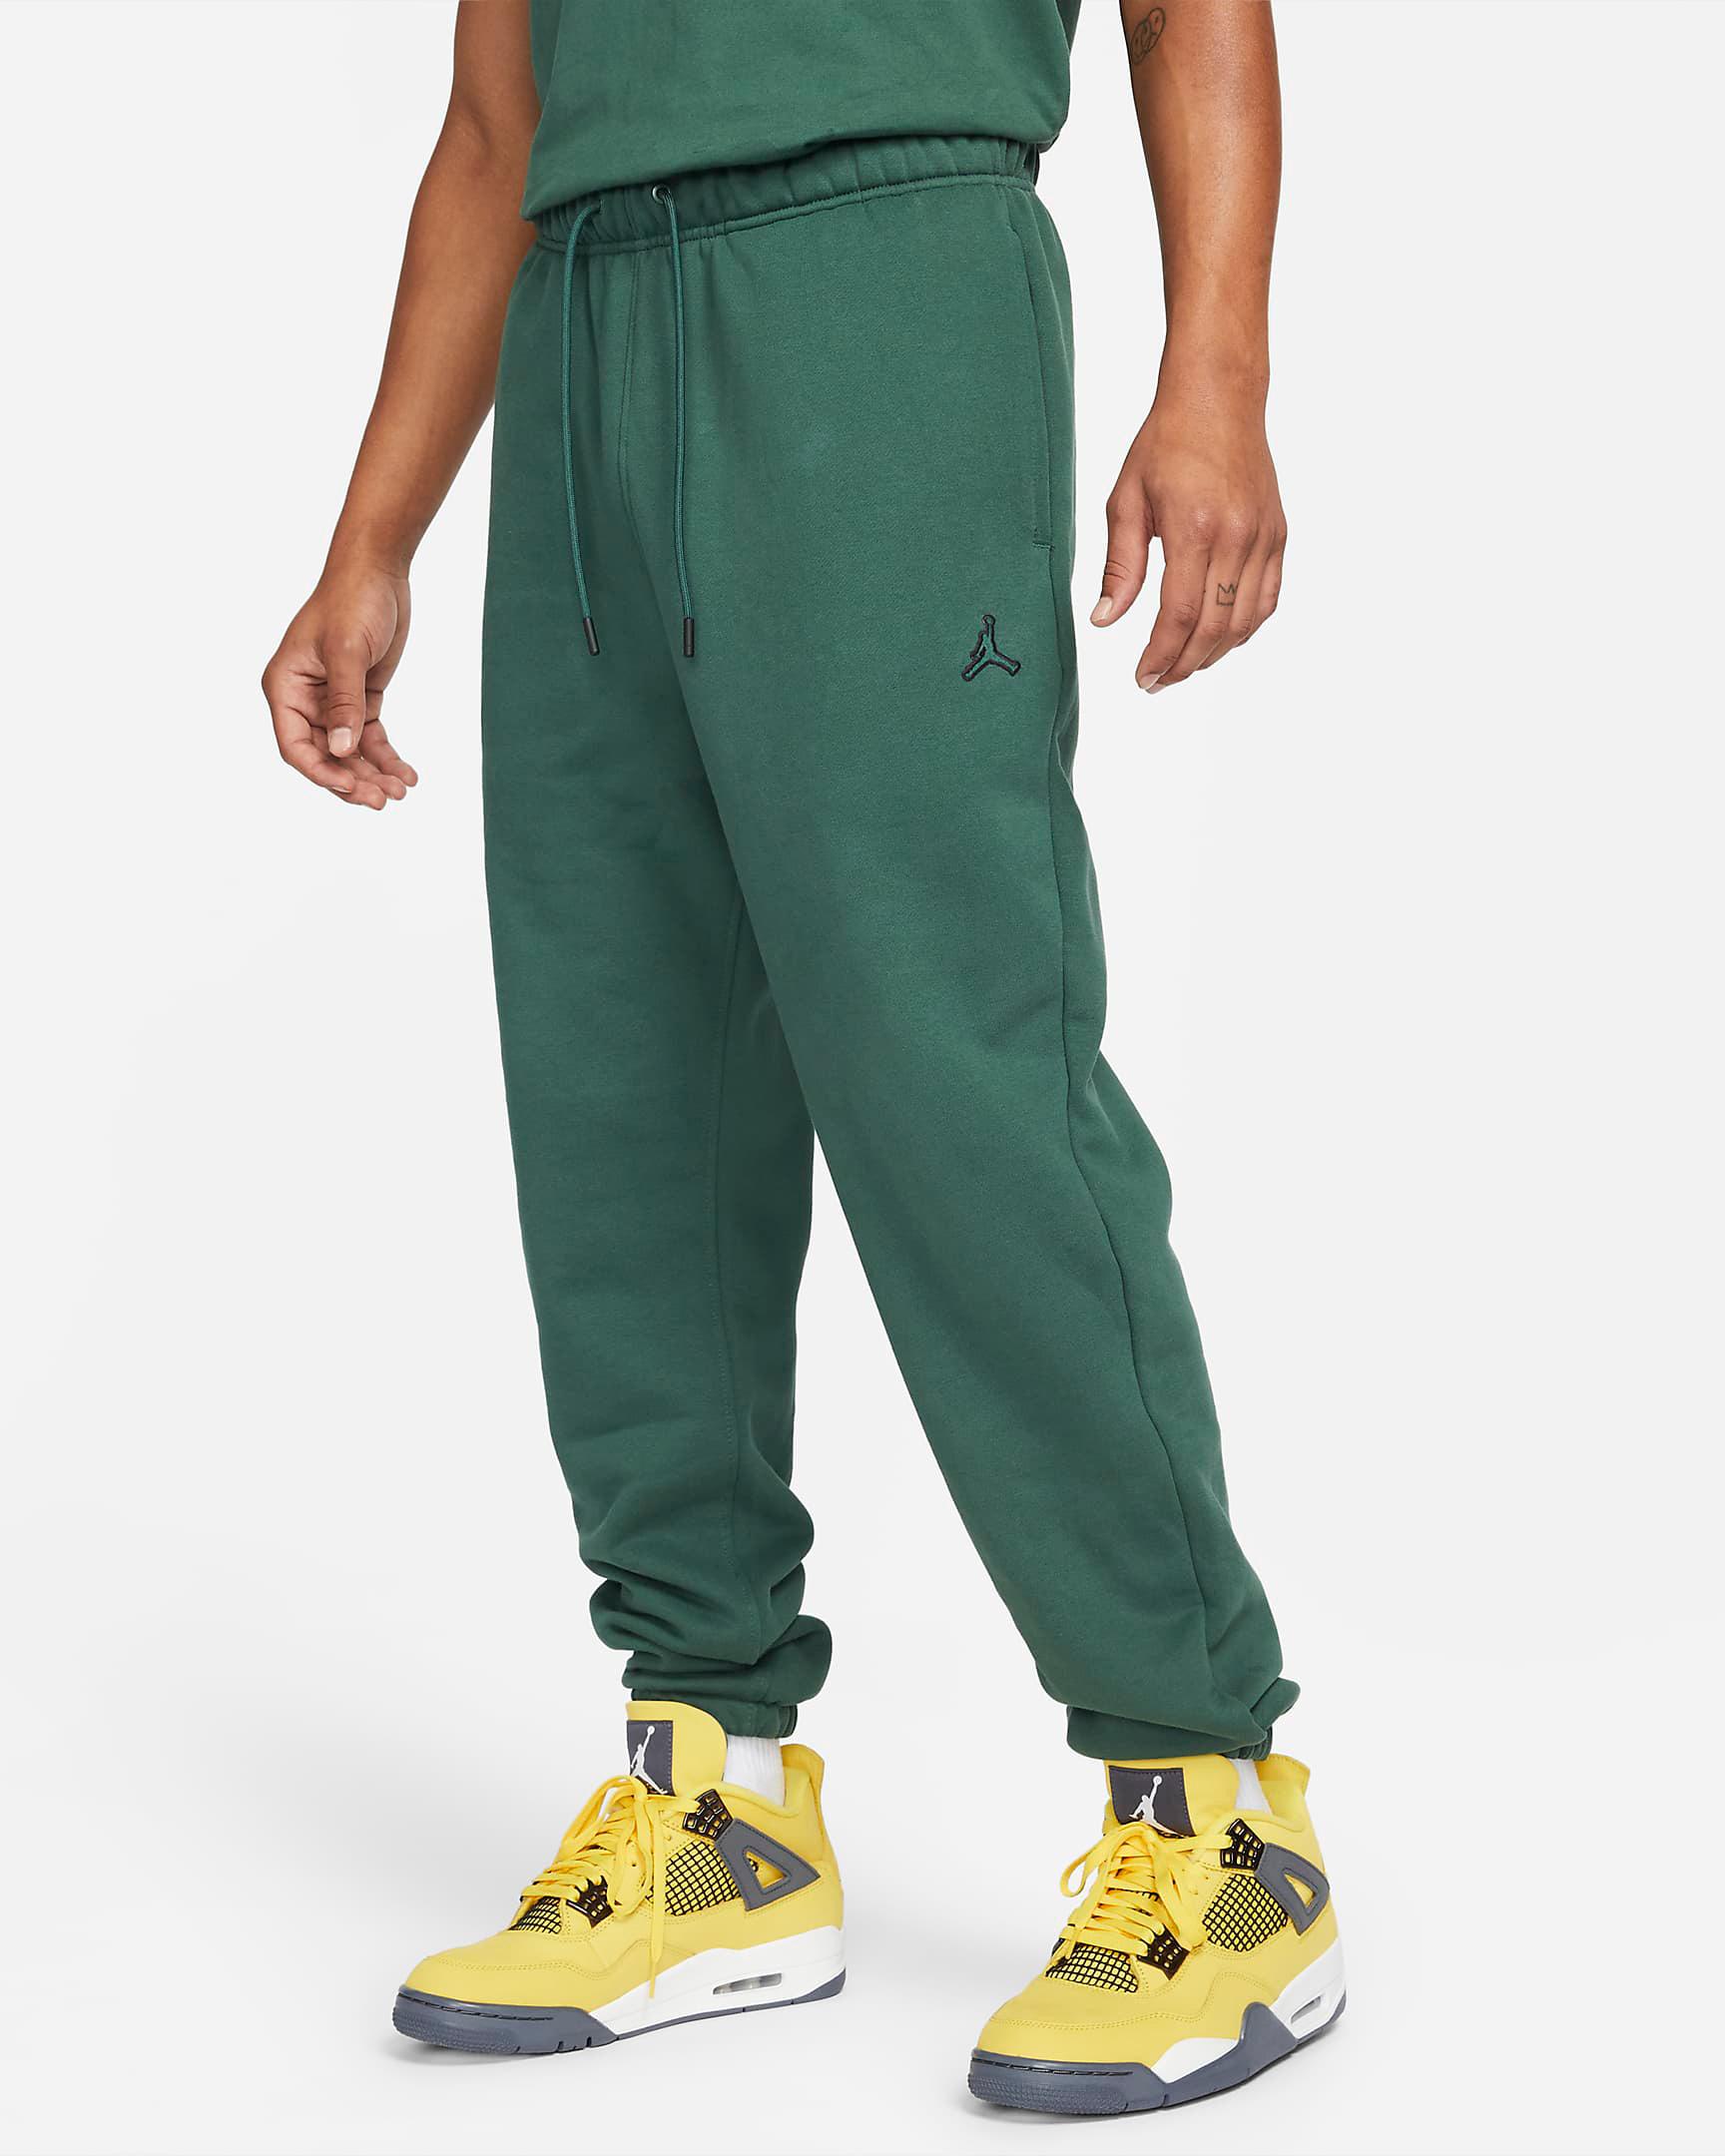 jordan-noble-green-statement-fleece-pants-1